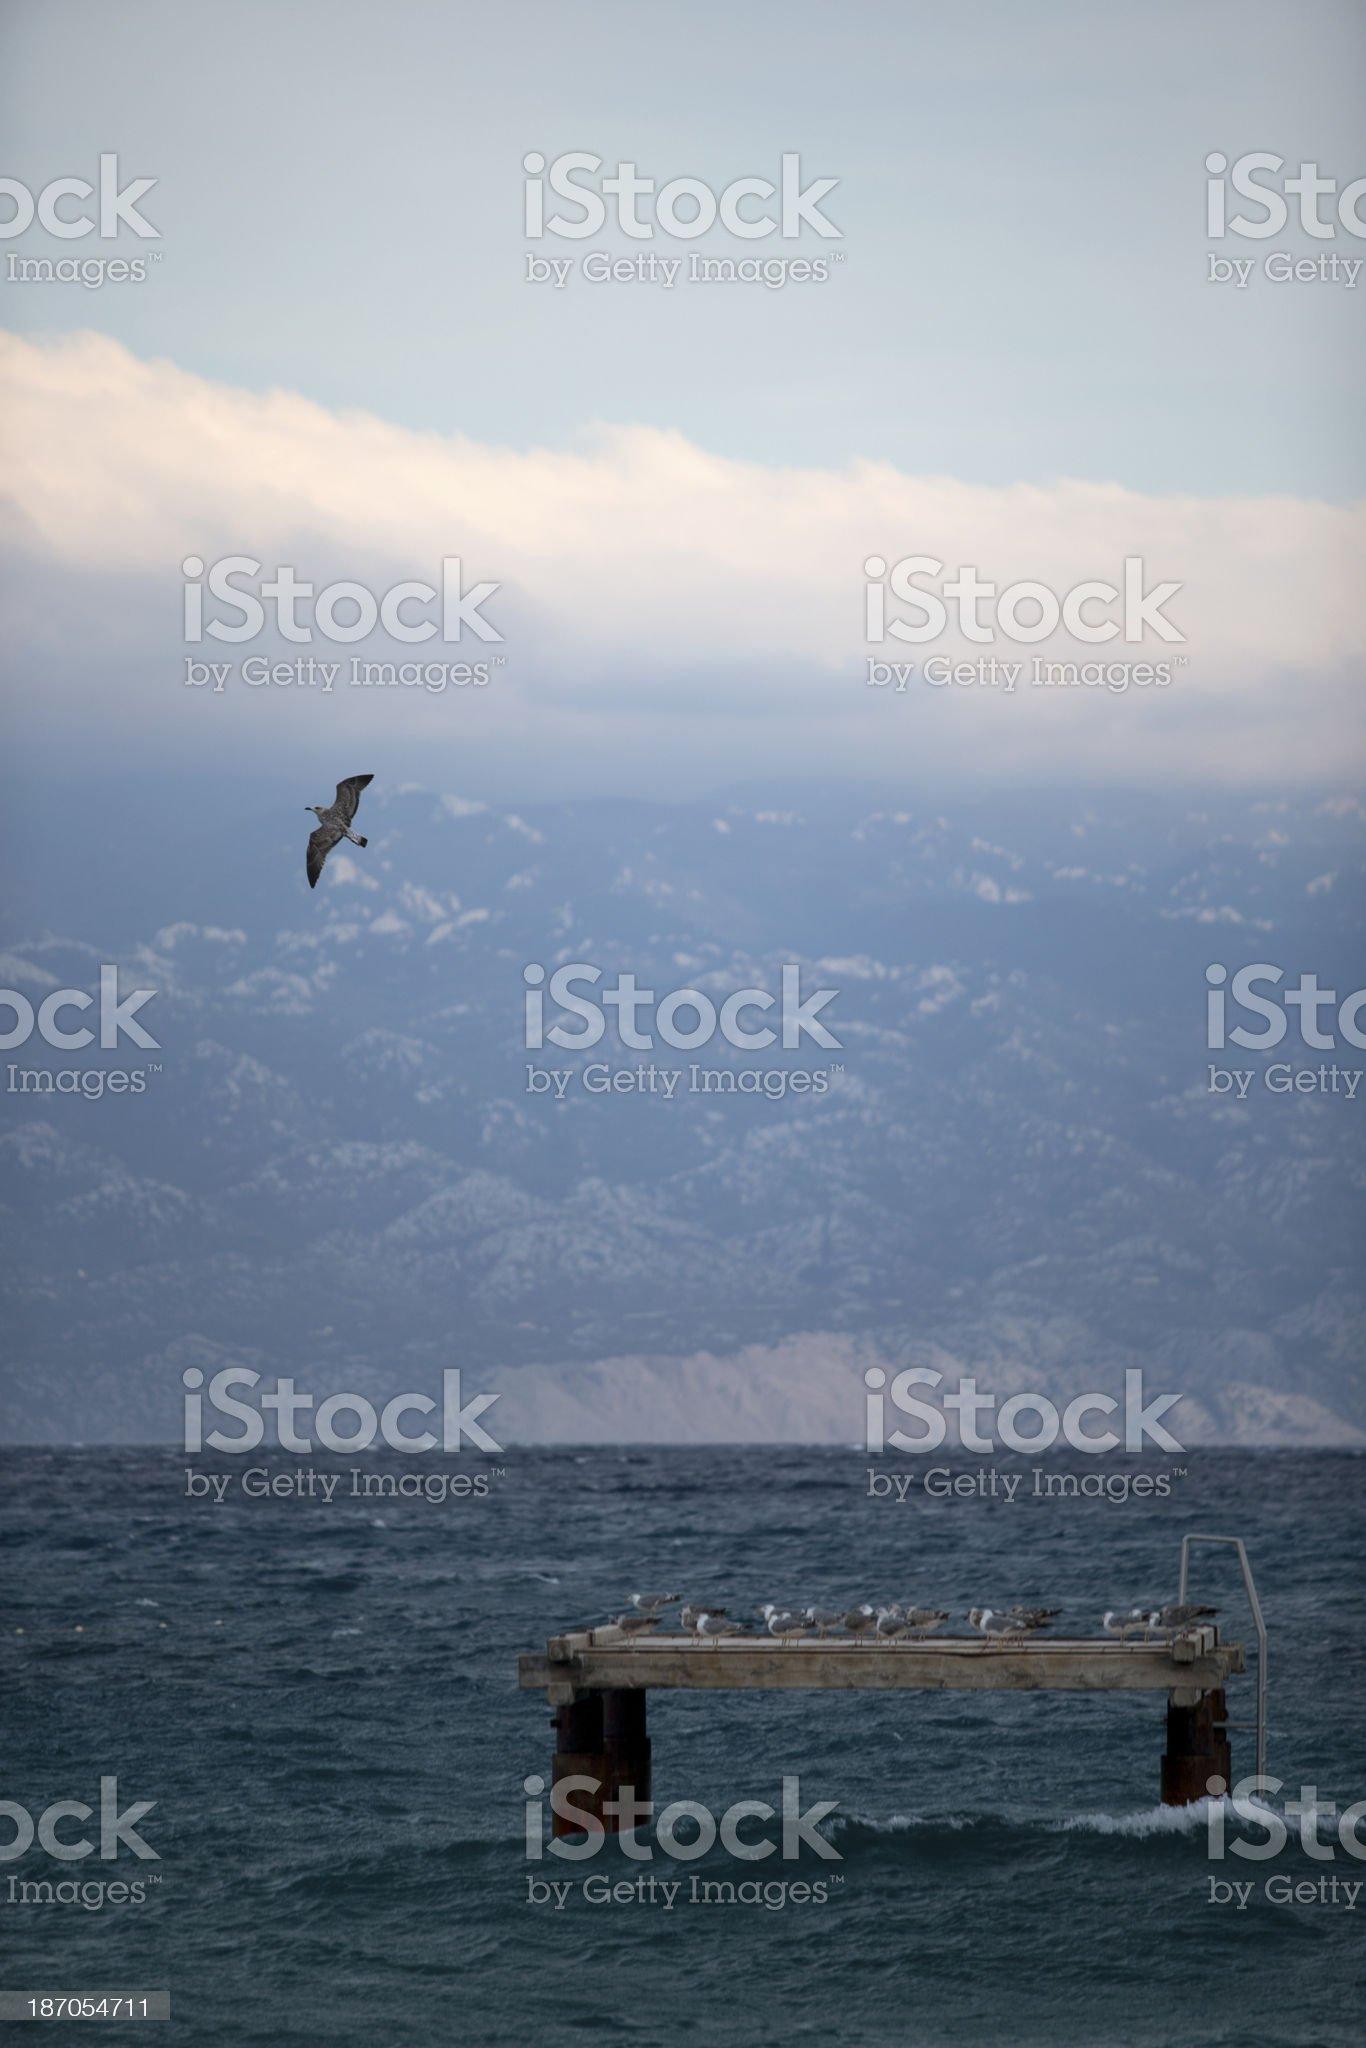 Bird in flight royalty-free stock photo